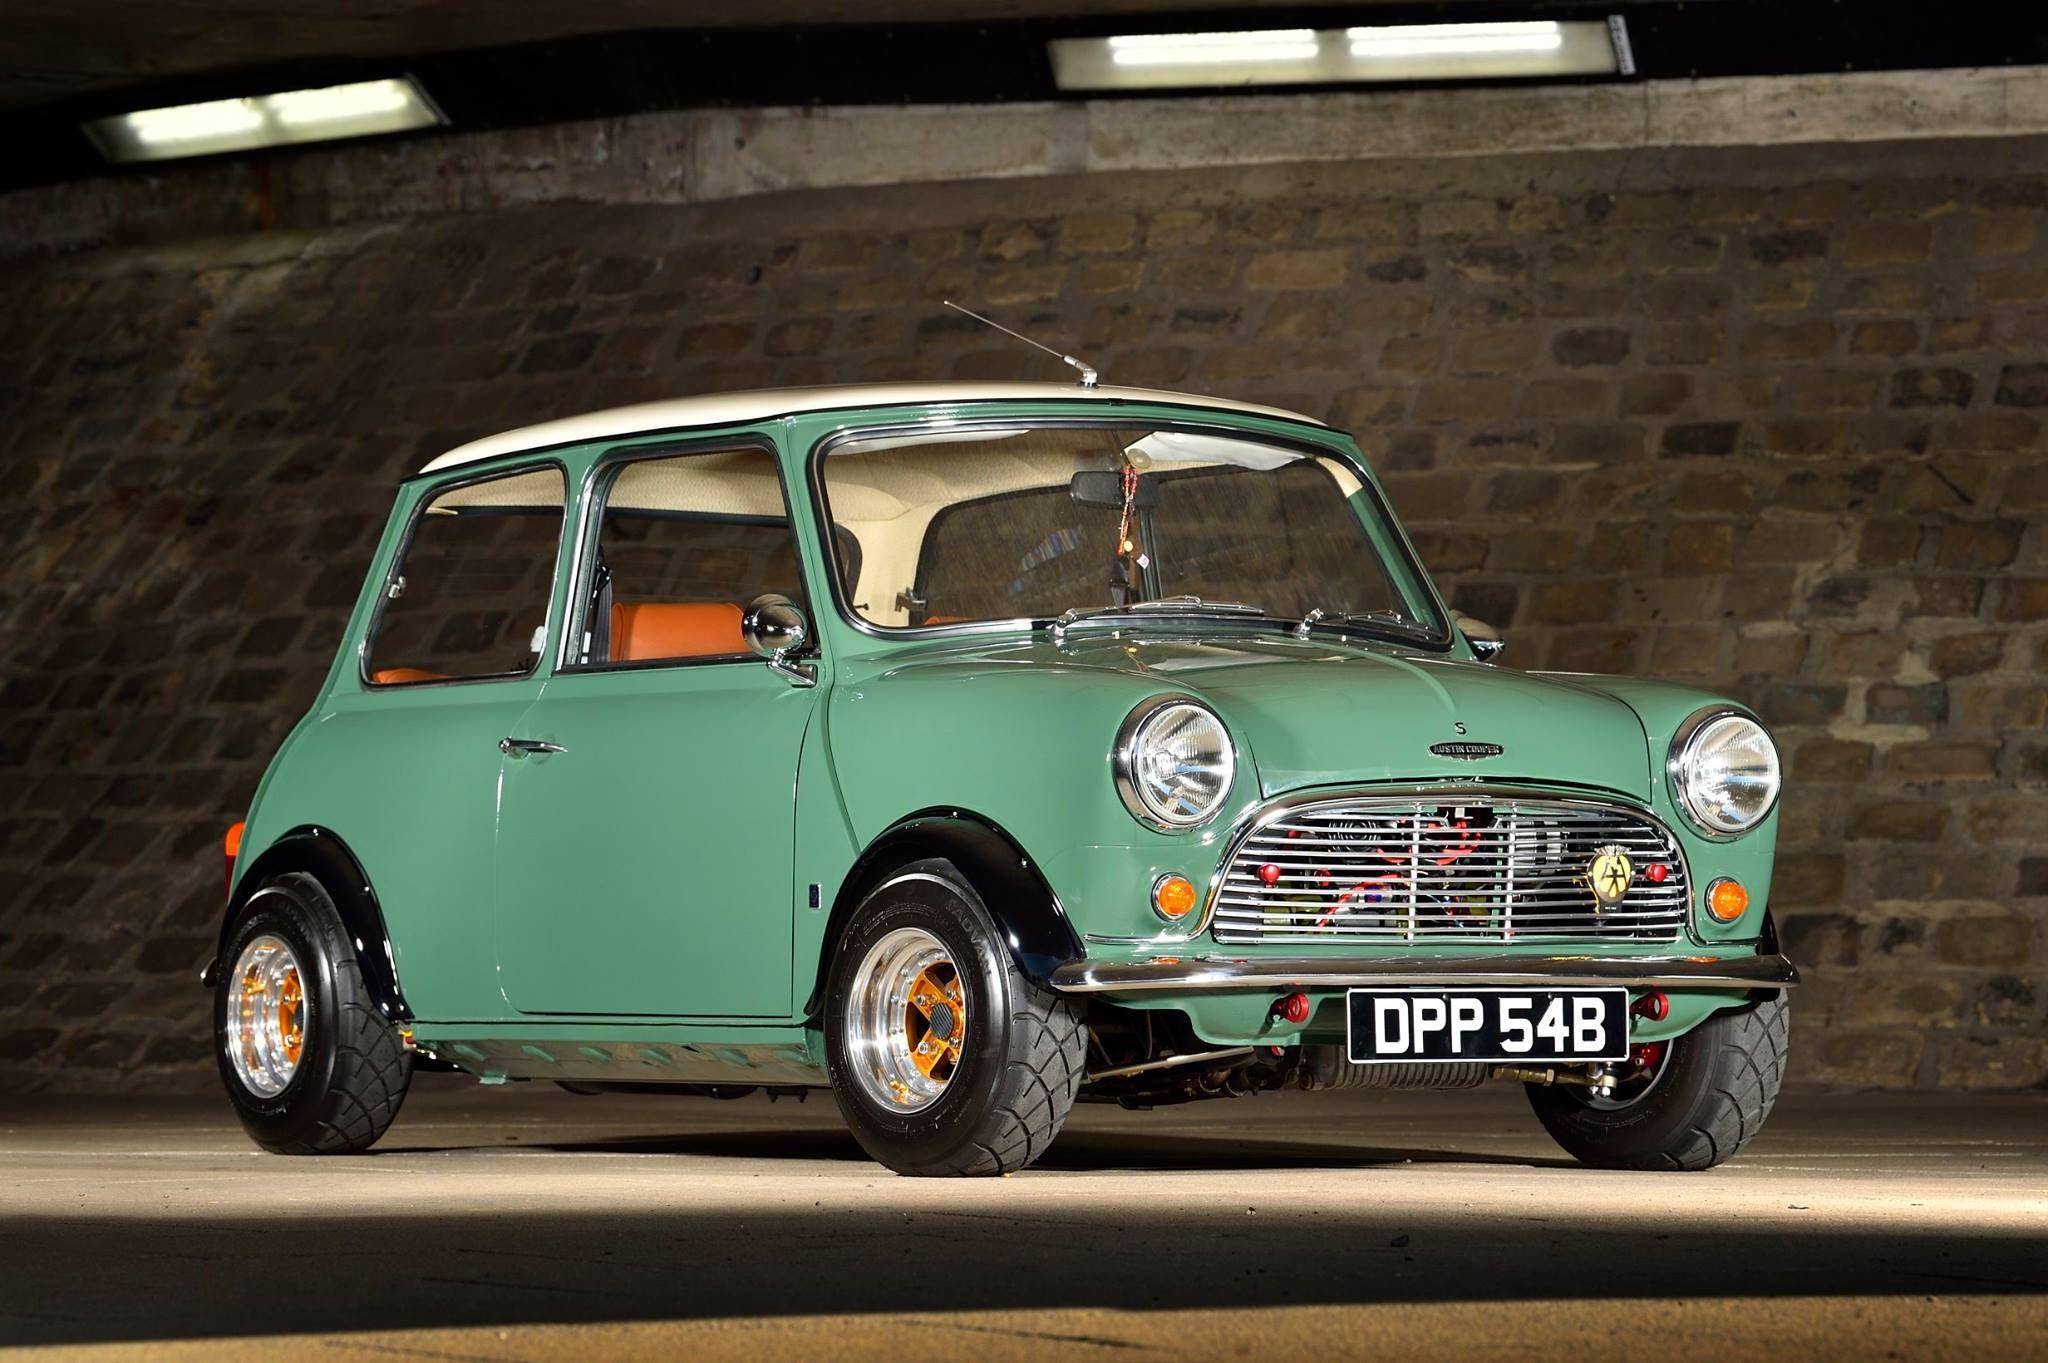 6de688f18d8 Almond green Austin Mini 1330 1275 Metro unit bored +60 to 1330cc ...